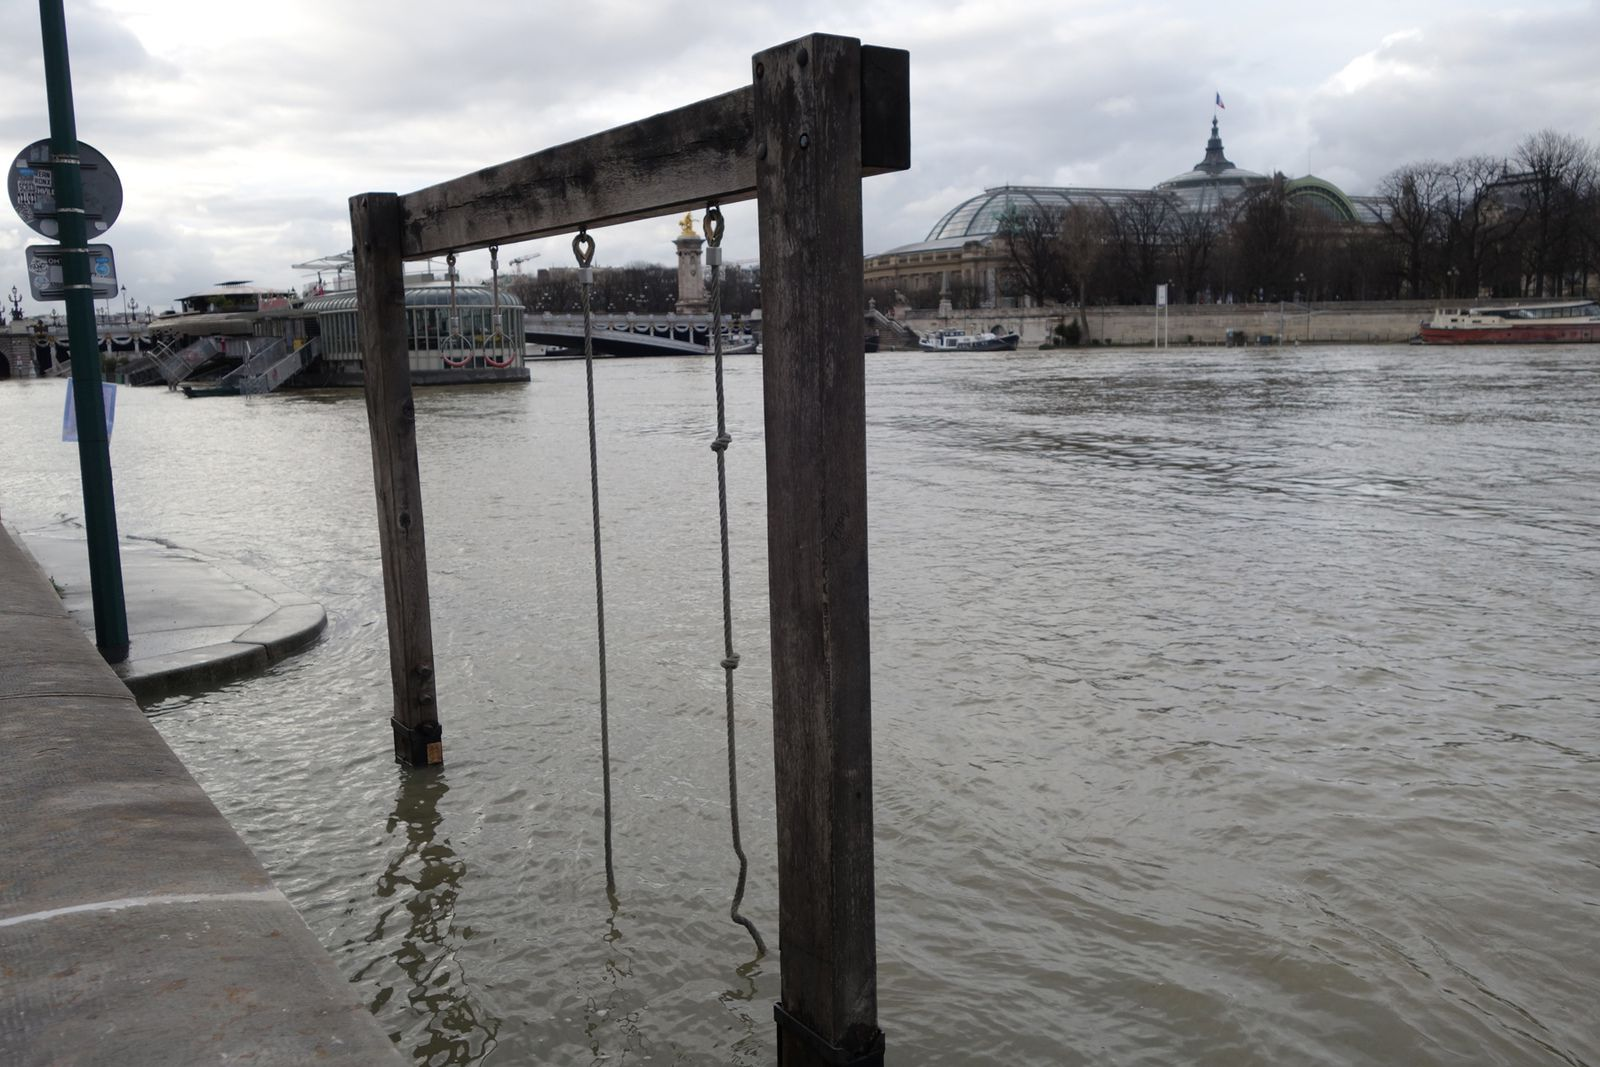 LA SEINE EN CRUE à PARIS, BALADE DE PONT EN PONT (05/02/2021)